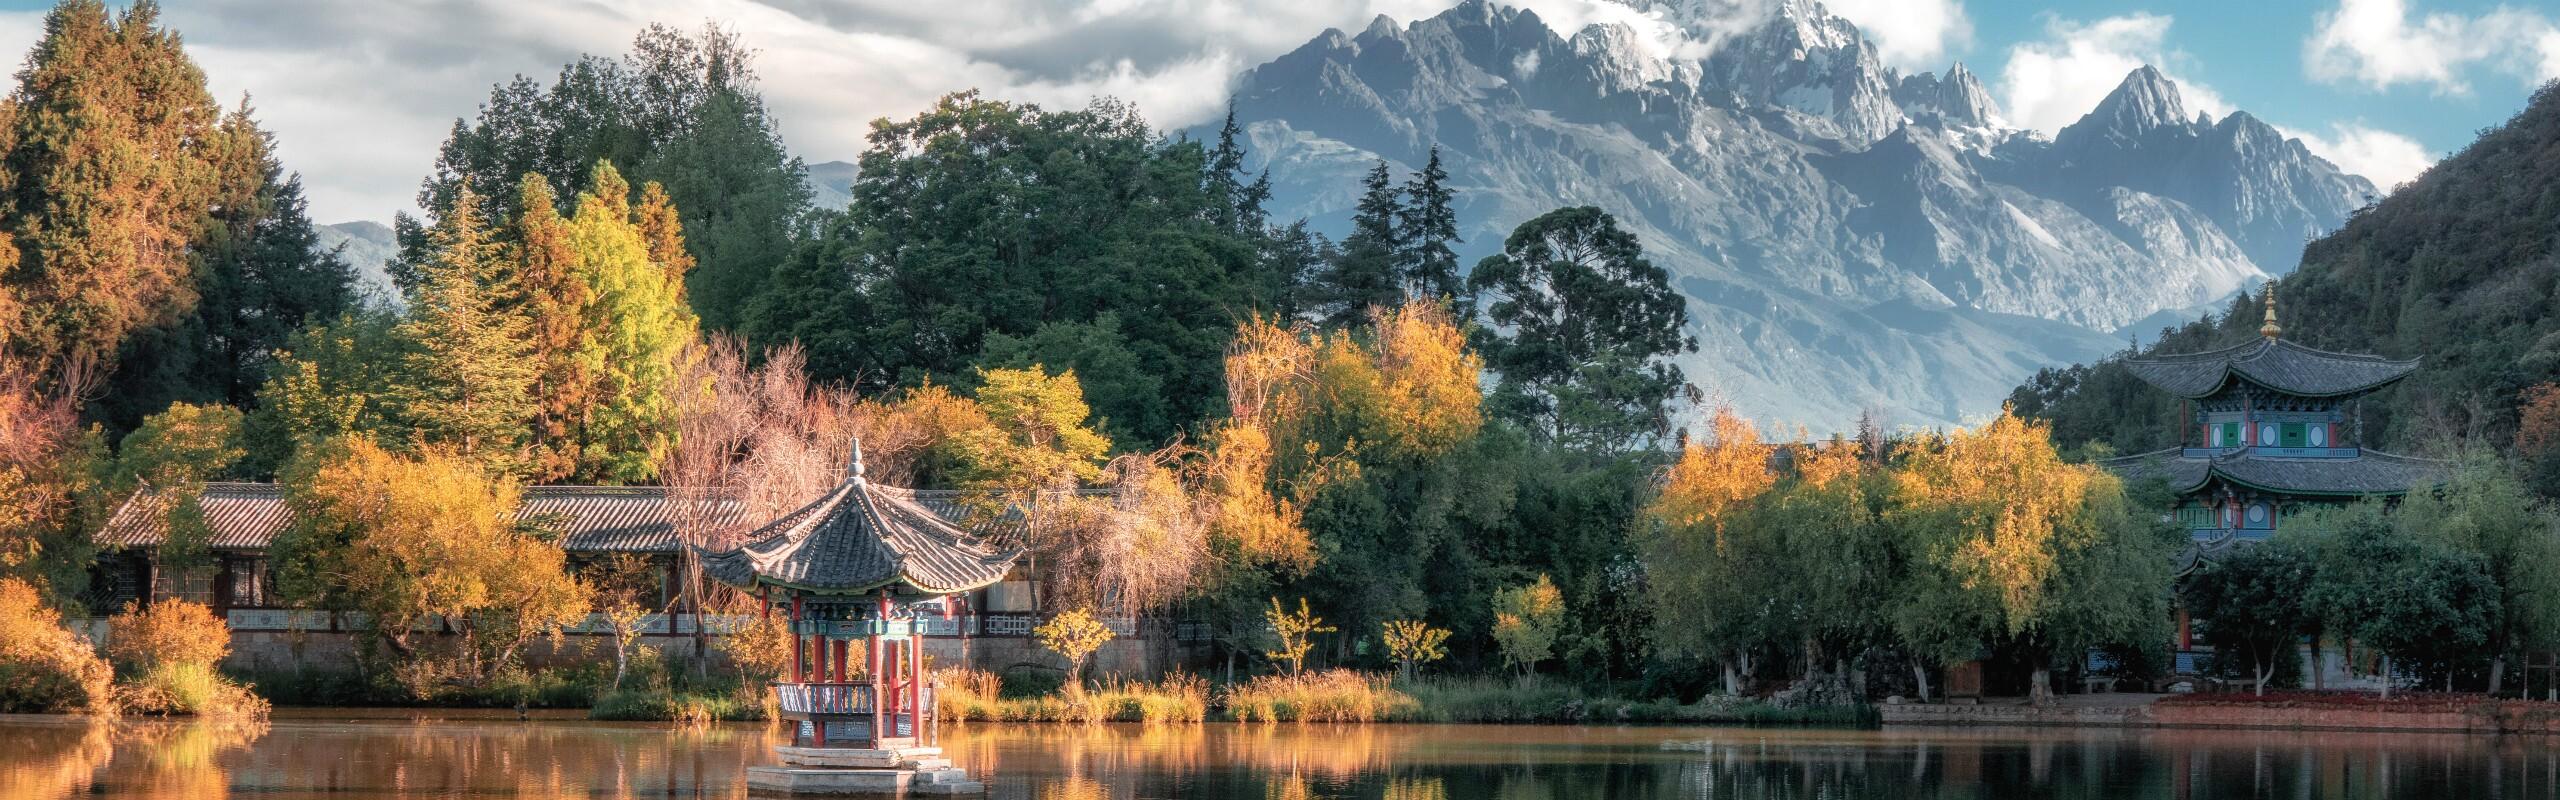 8-Day Kunming, Dali, Lijiang, and Shangri-La Tour